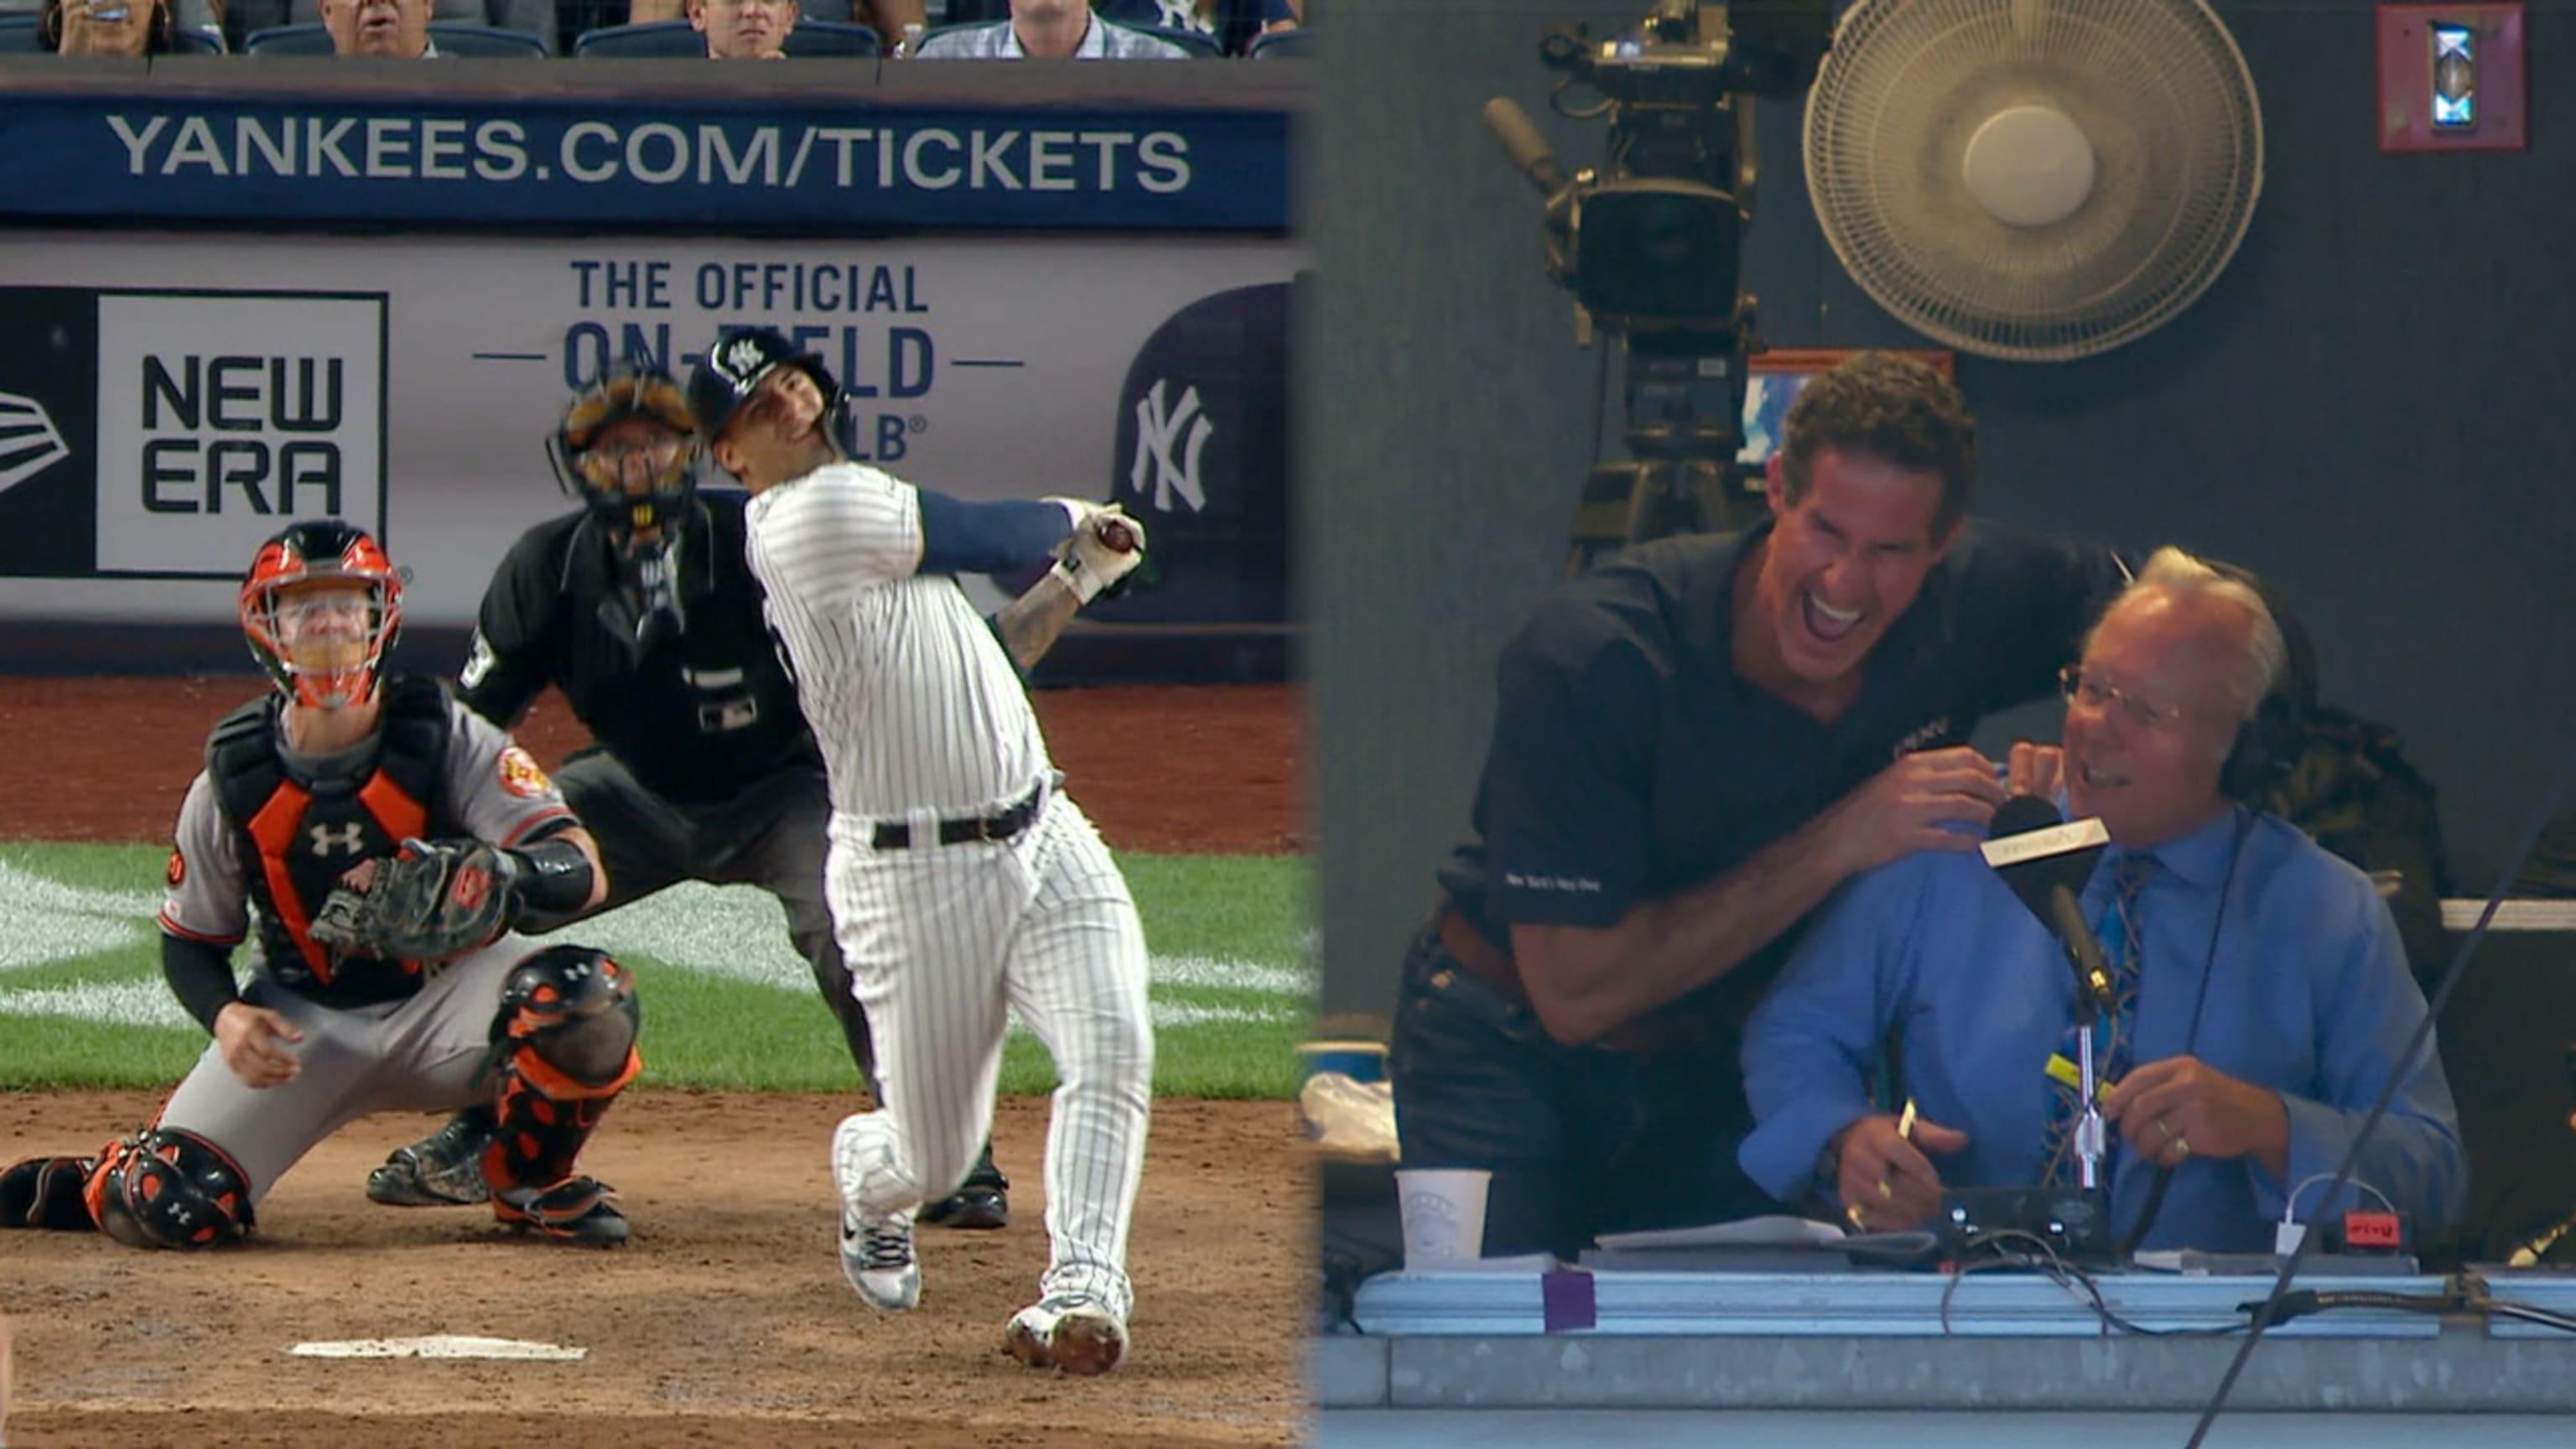 Yankees Home Runs 2020.Gleyber Torres Keeps Hitting Homers Vs Orioles New York